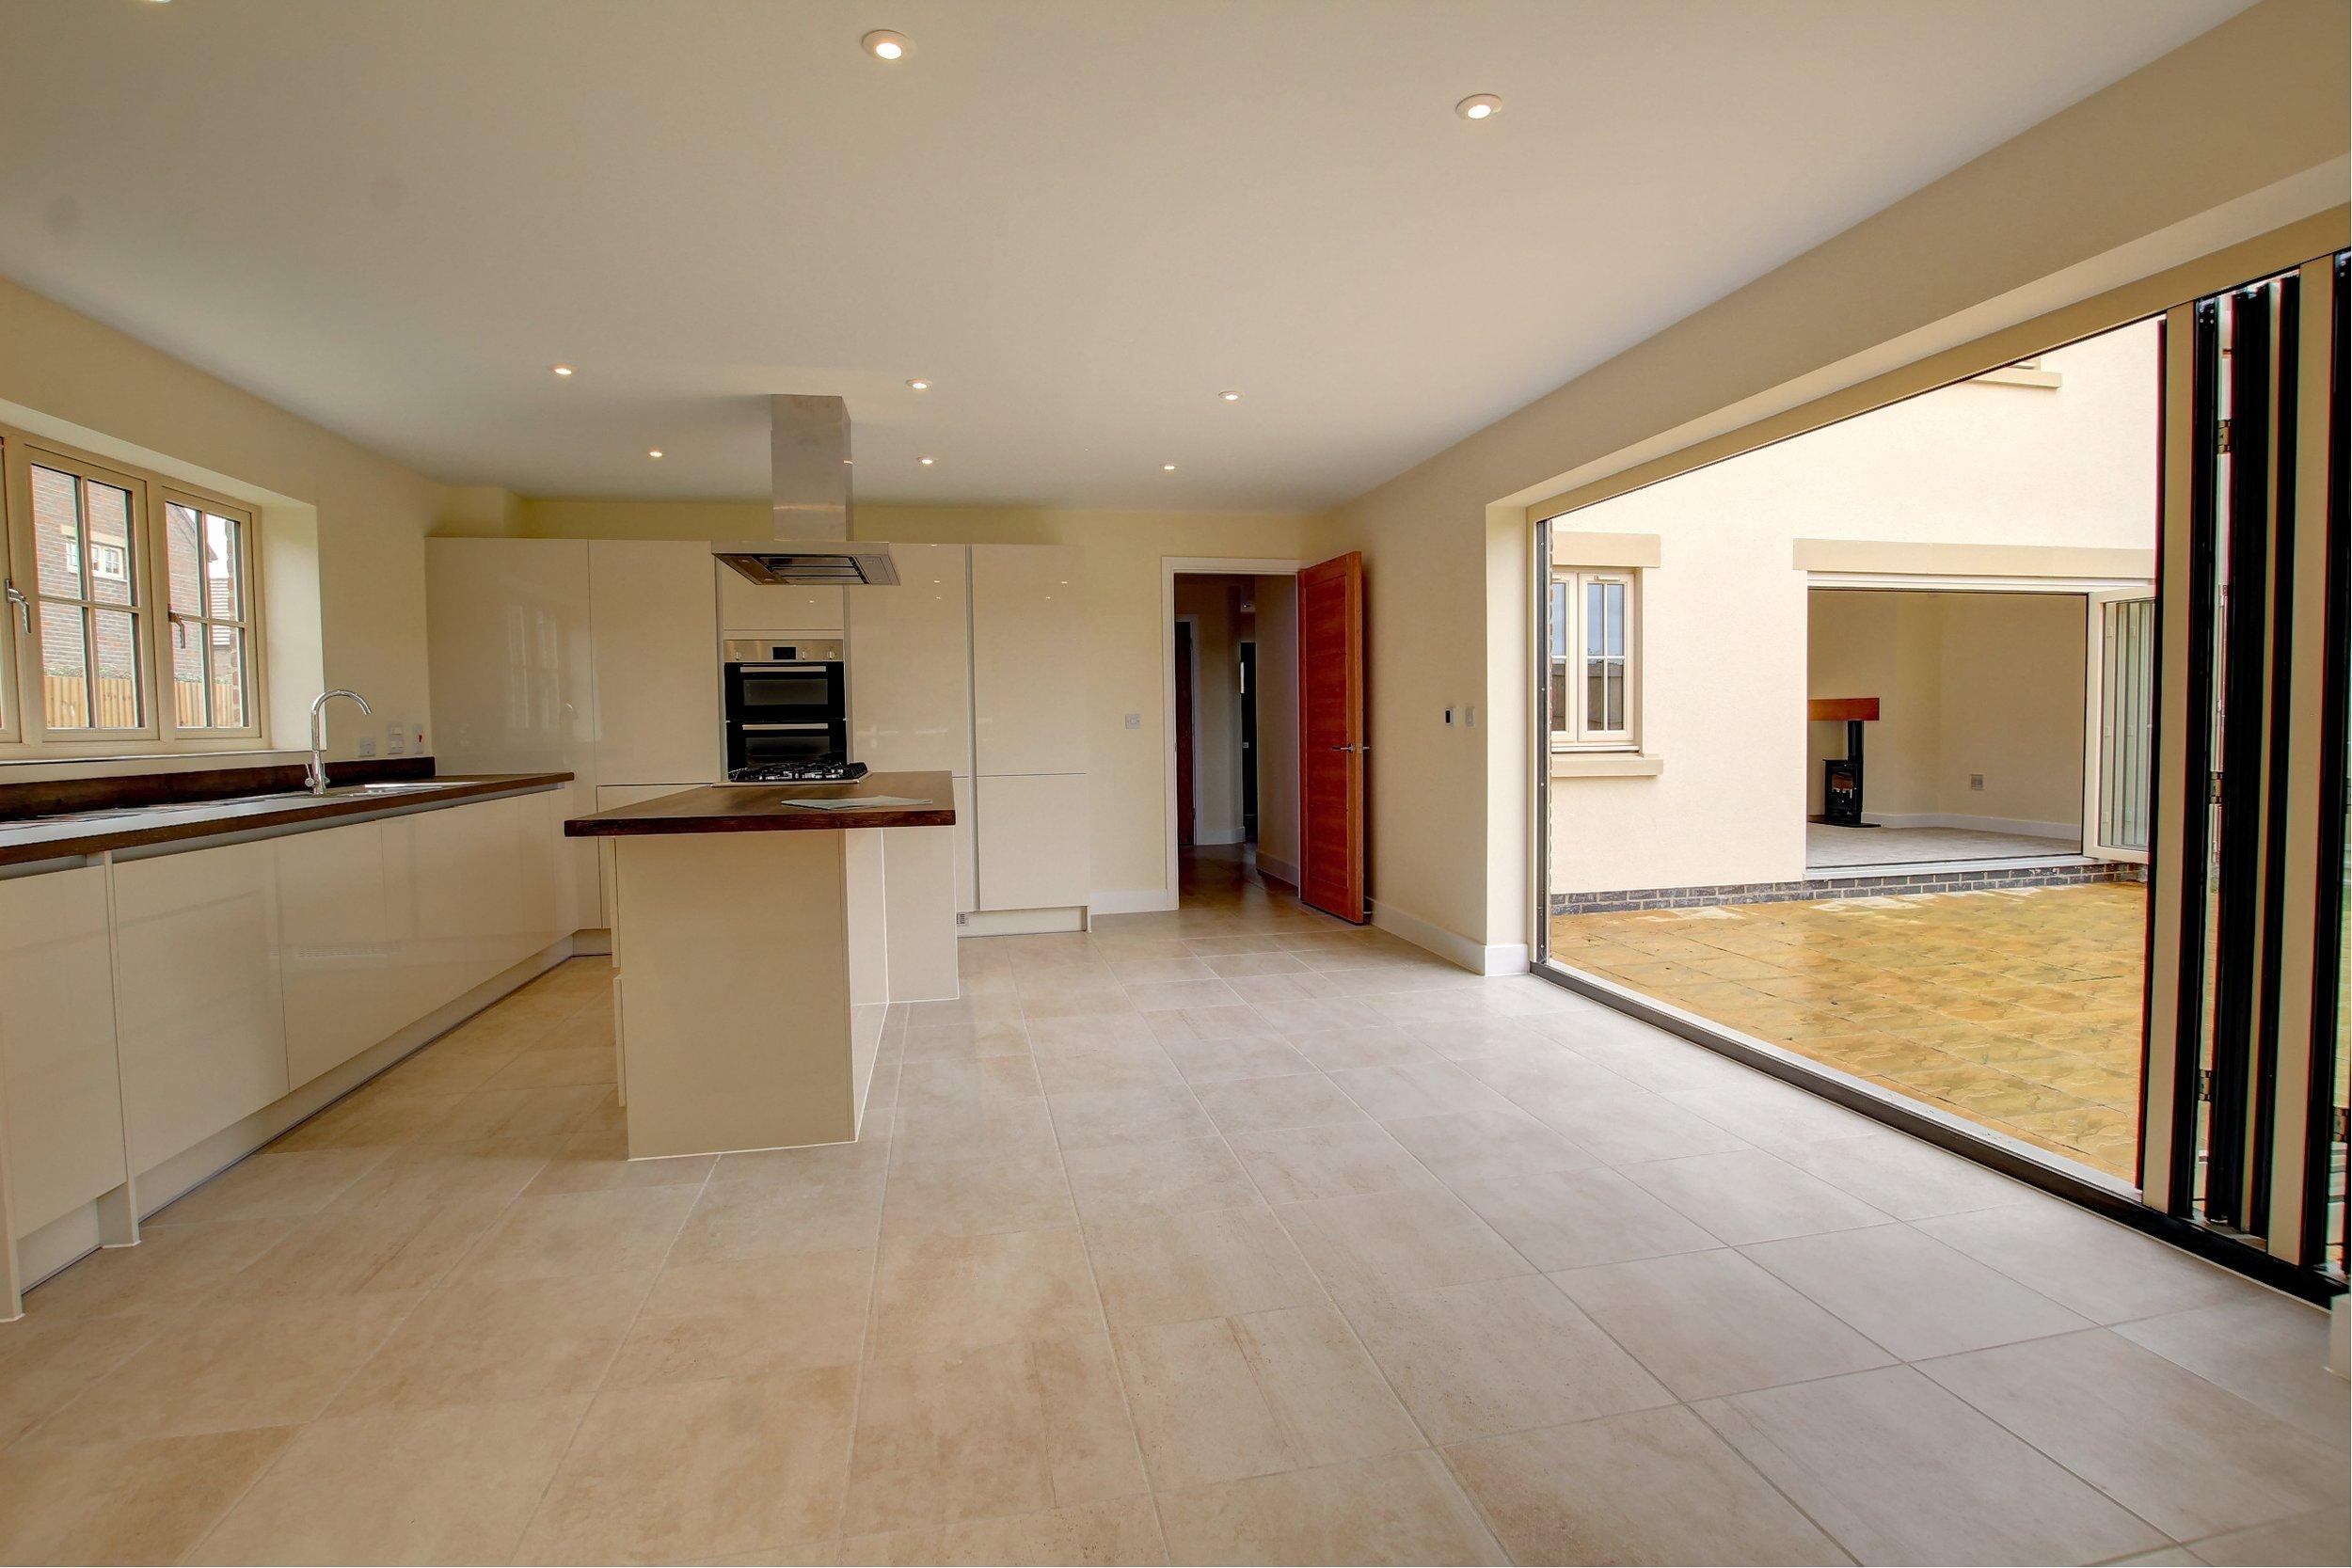 31 kitchen and lounge bi-folds.jpg